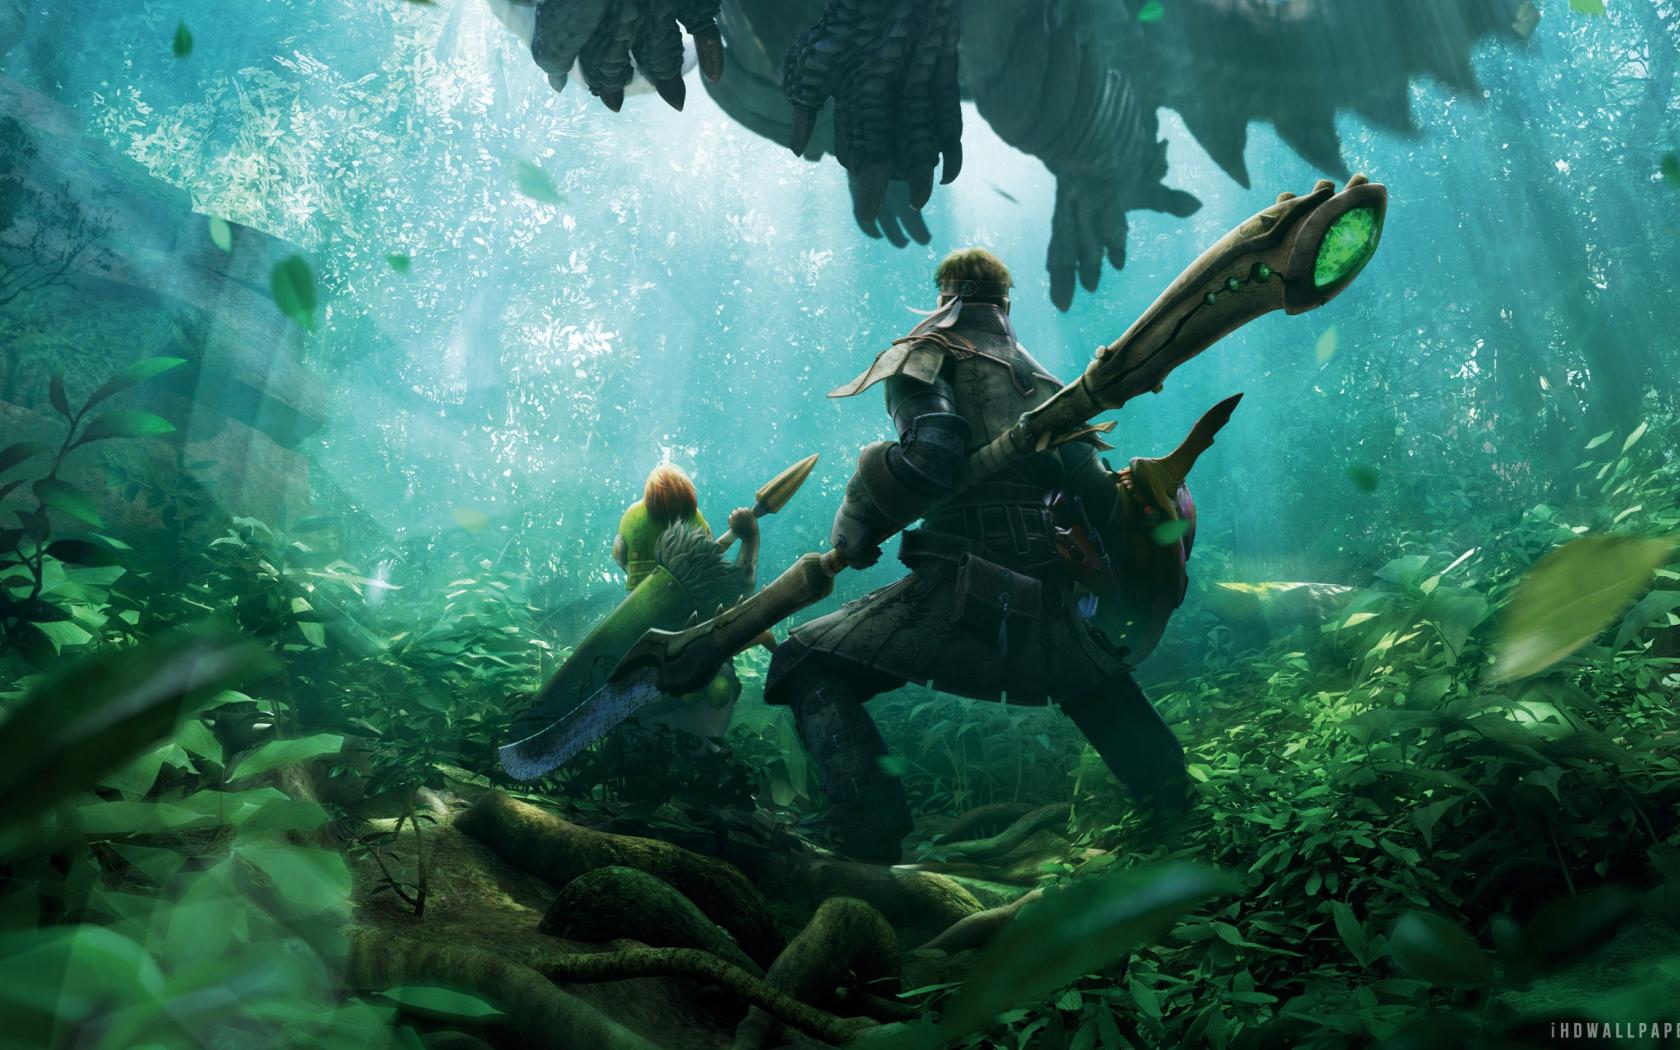 Free Download Monster Hunter 4 Ultimate Game Hd Wallpaper Ihd